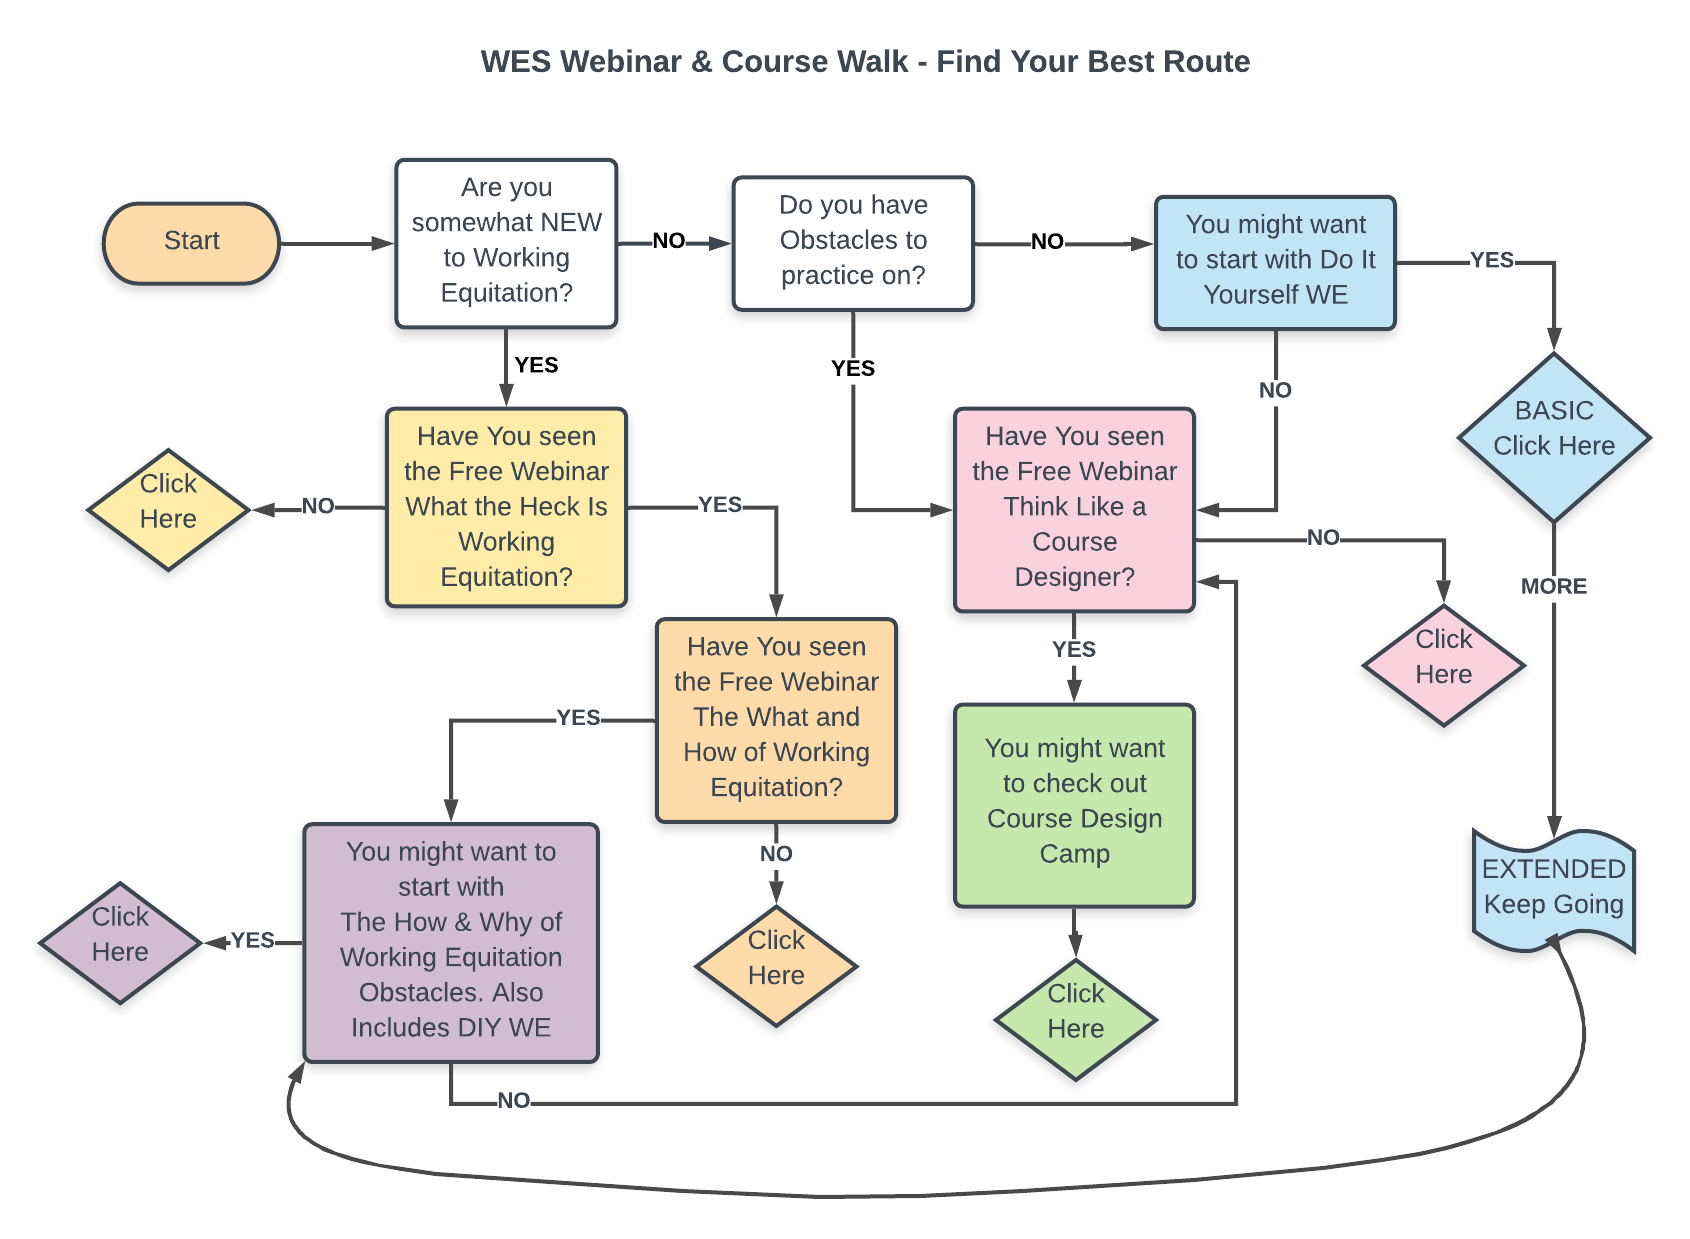 Find your best route flowchart